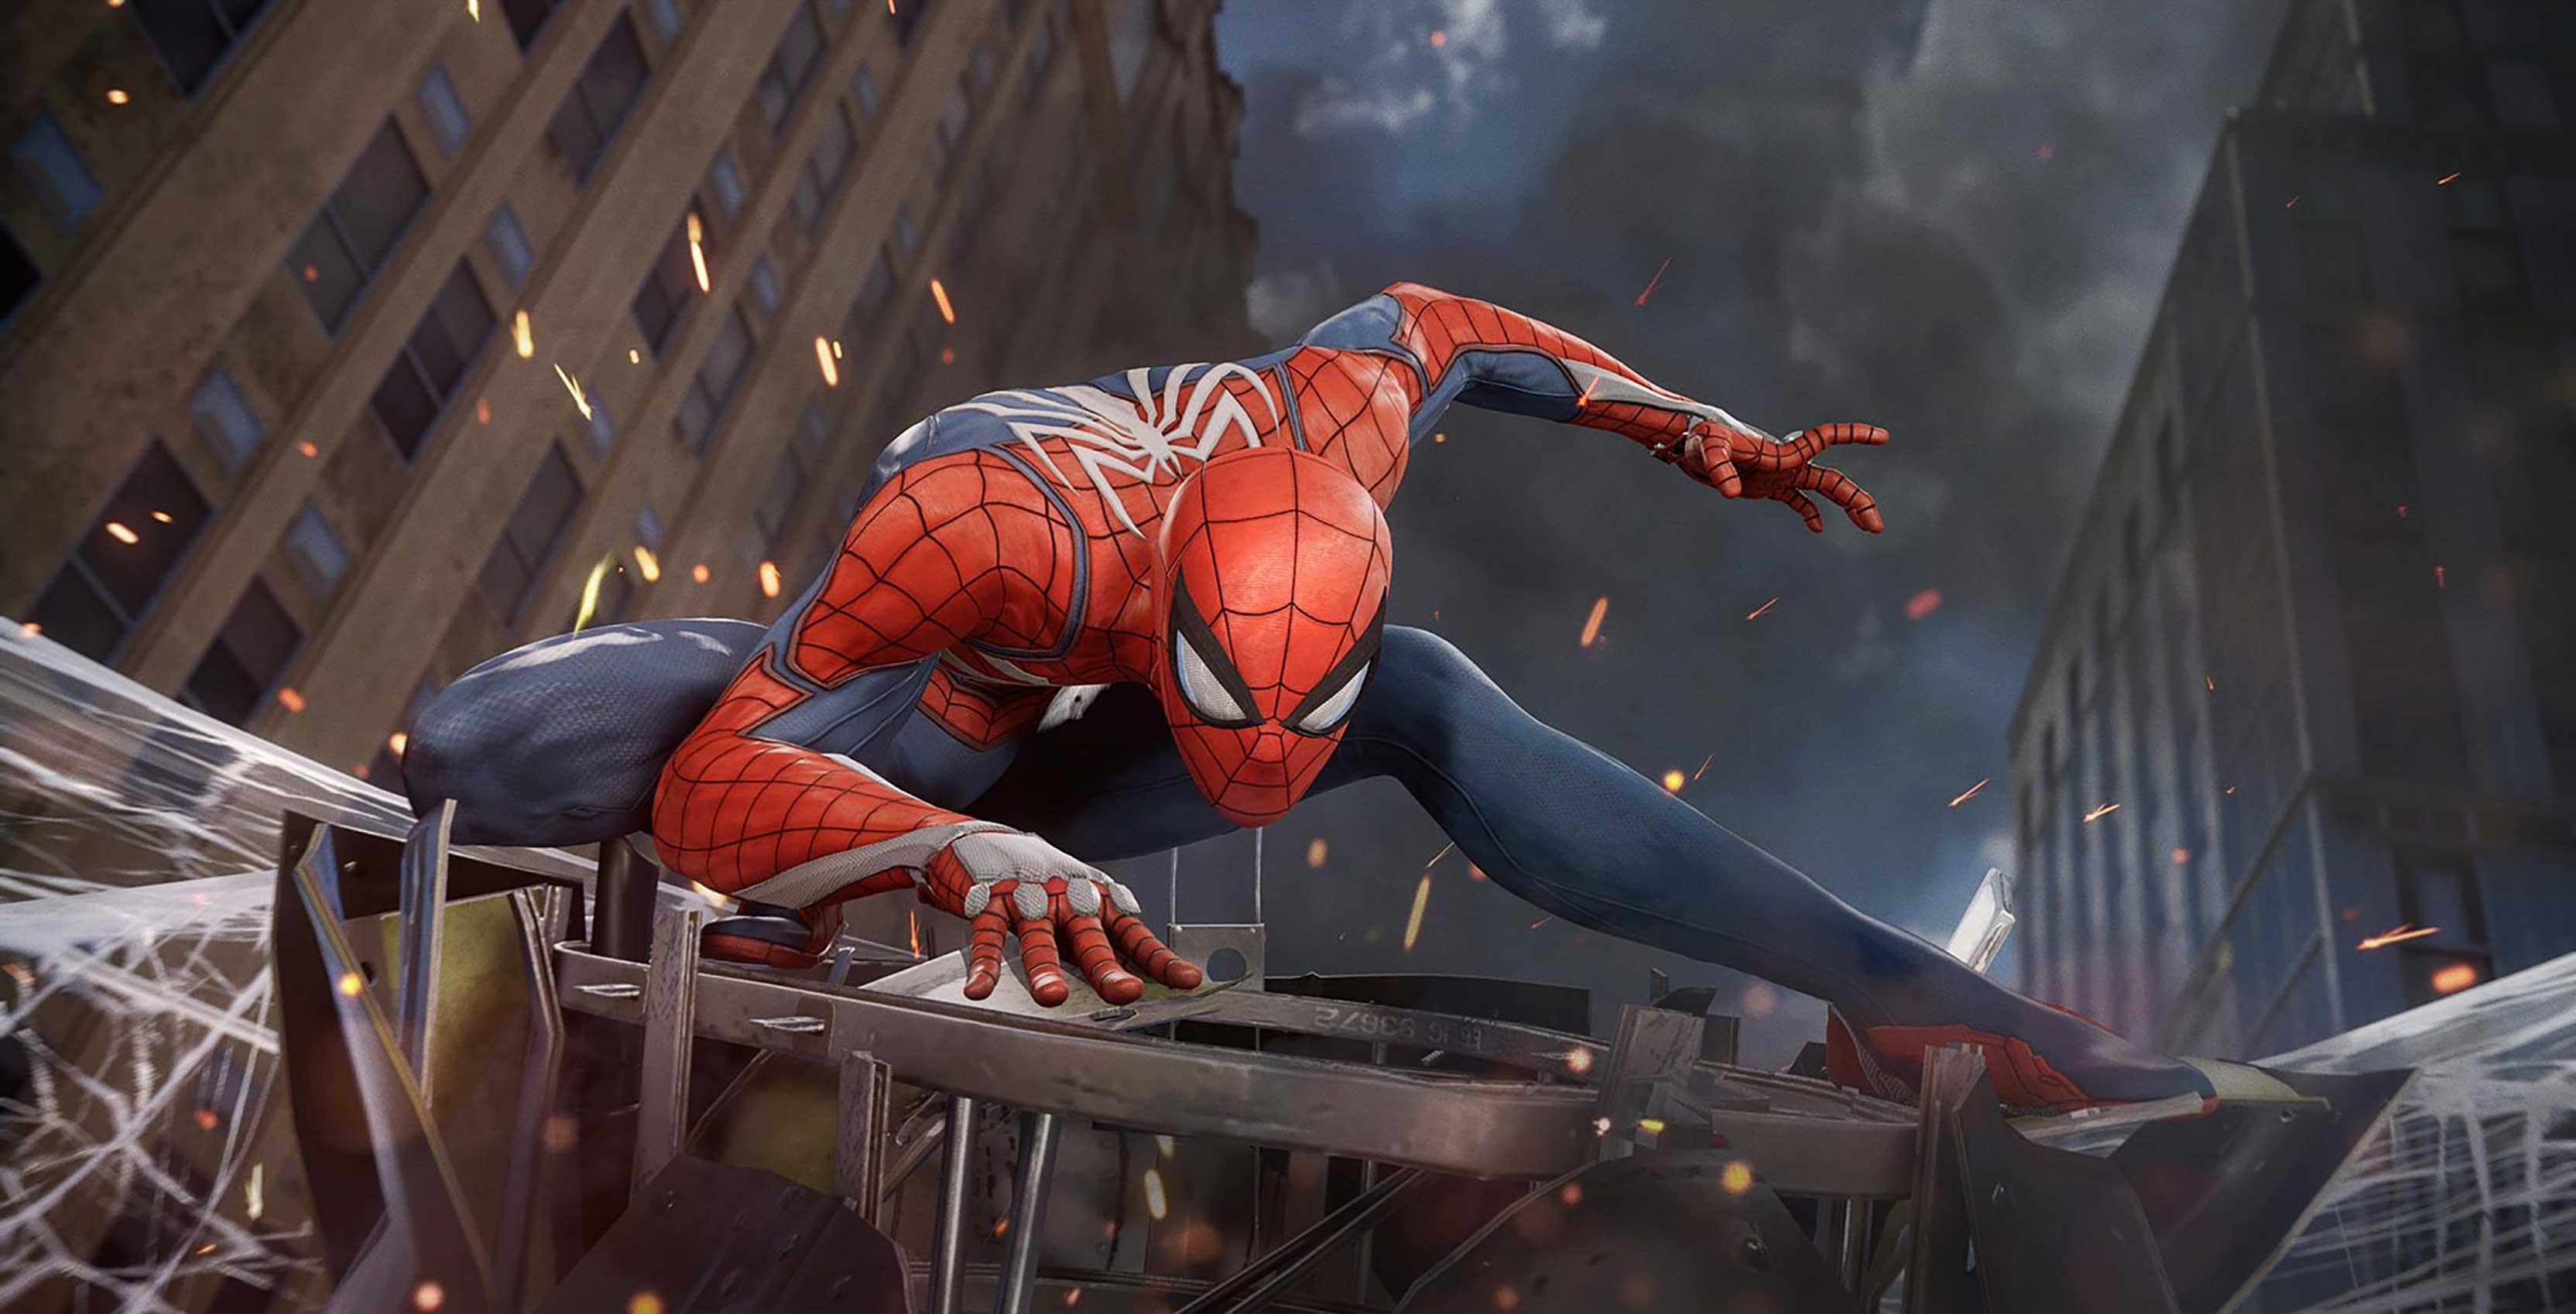 Spider-Man on webbing